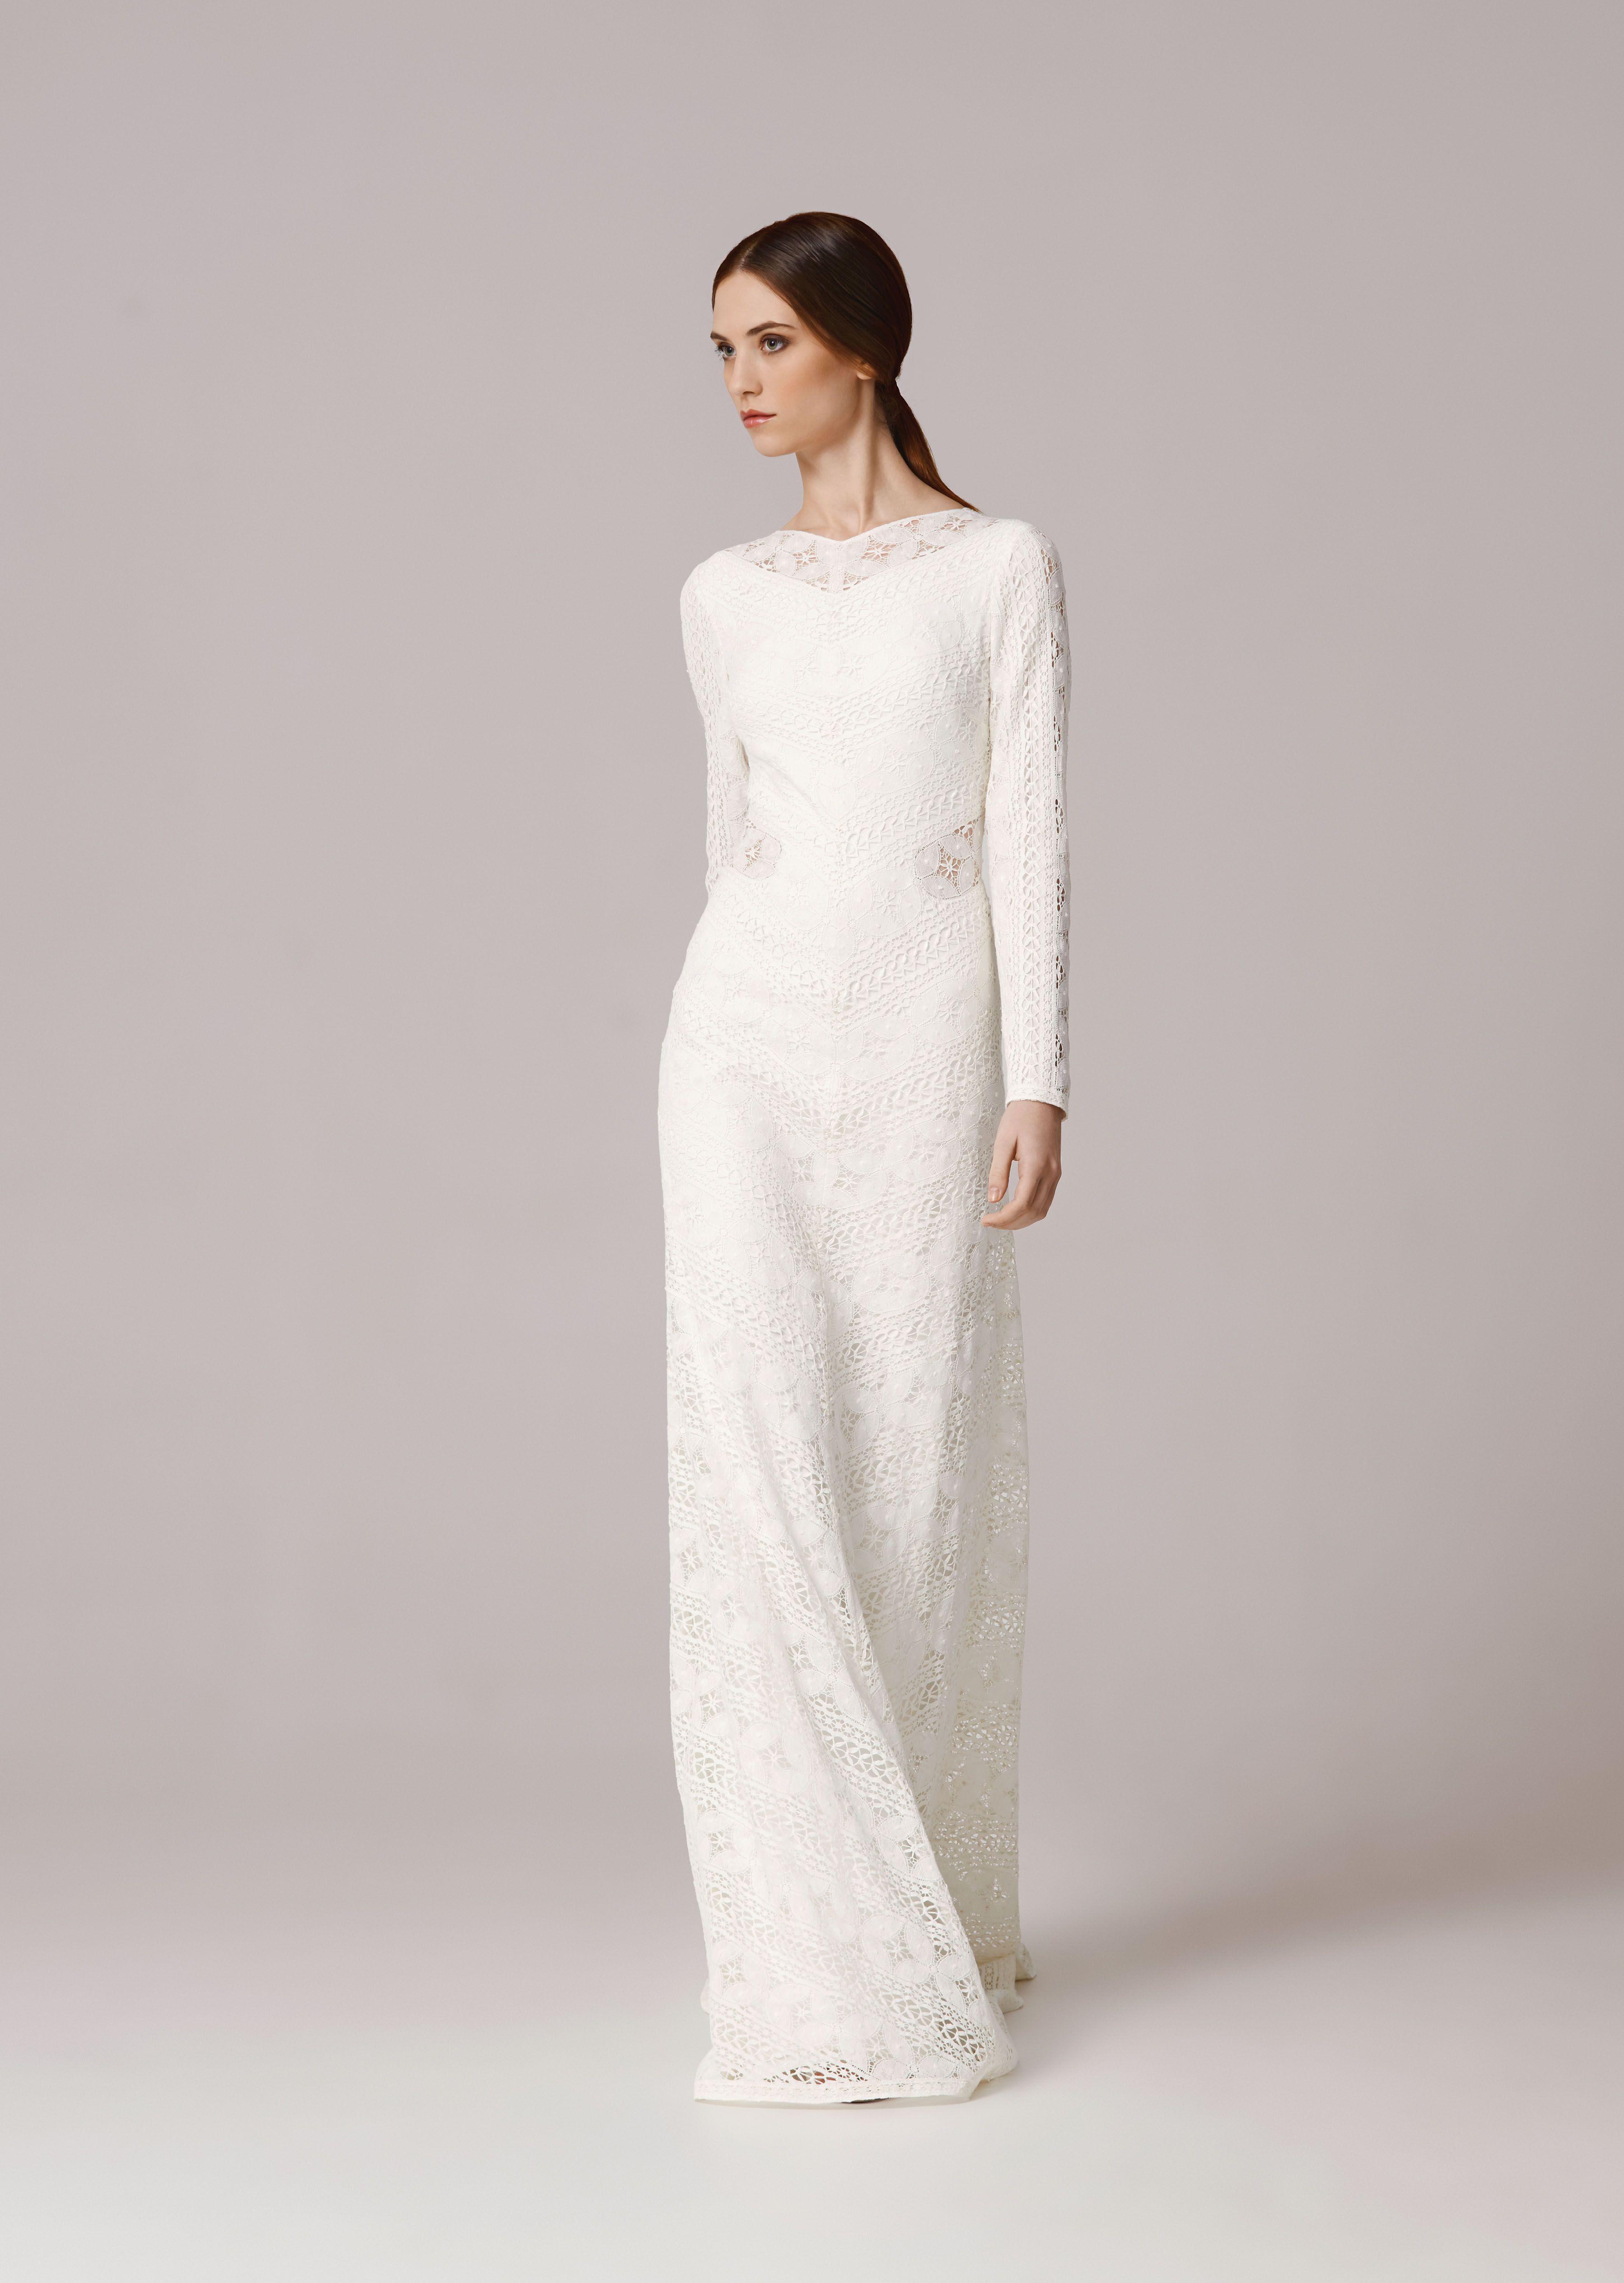 Nice dresses for wedding  NAHELE  Suknie Ślubne Anna Kara  The dress  Pinterest  Bridal